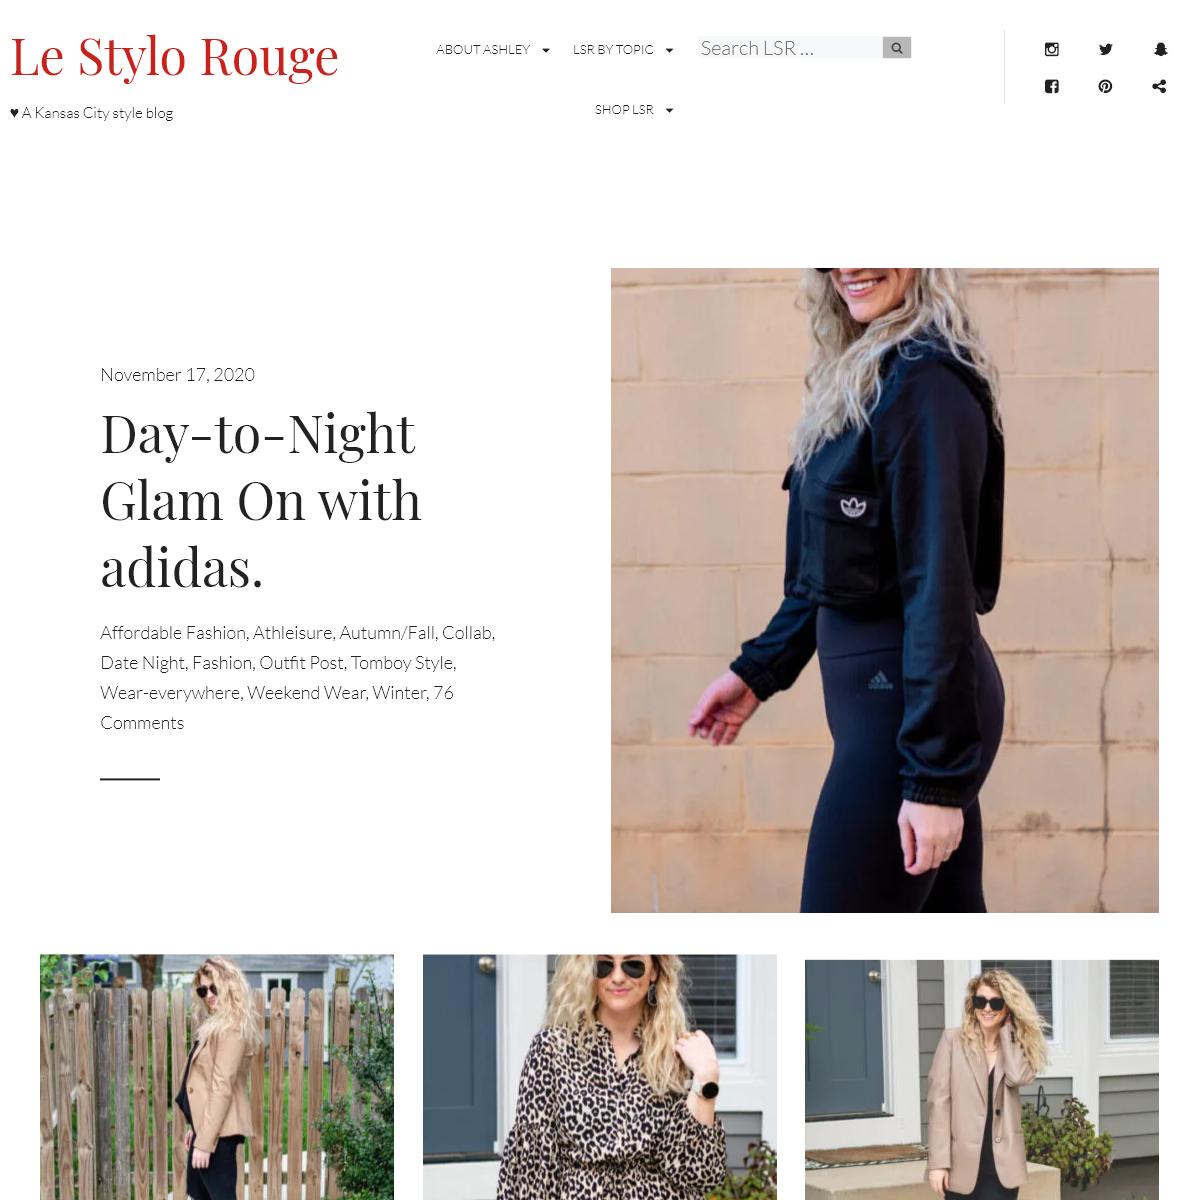 Le Stylo Rouge - A Kansas City style blog